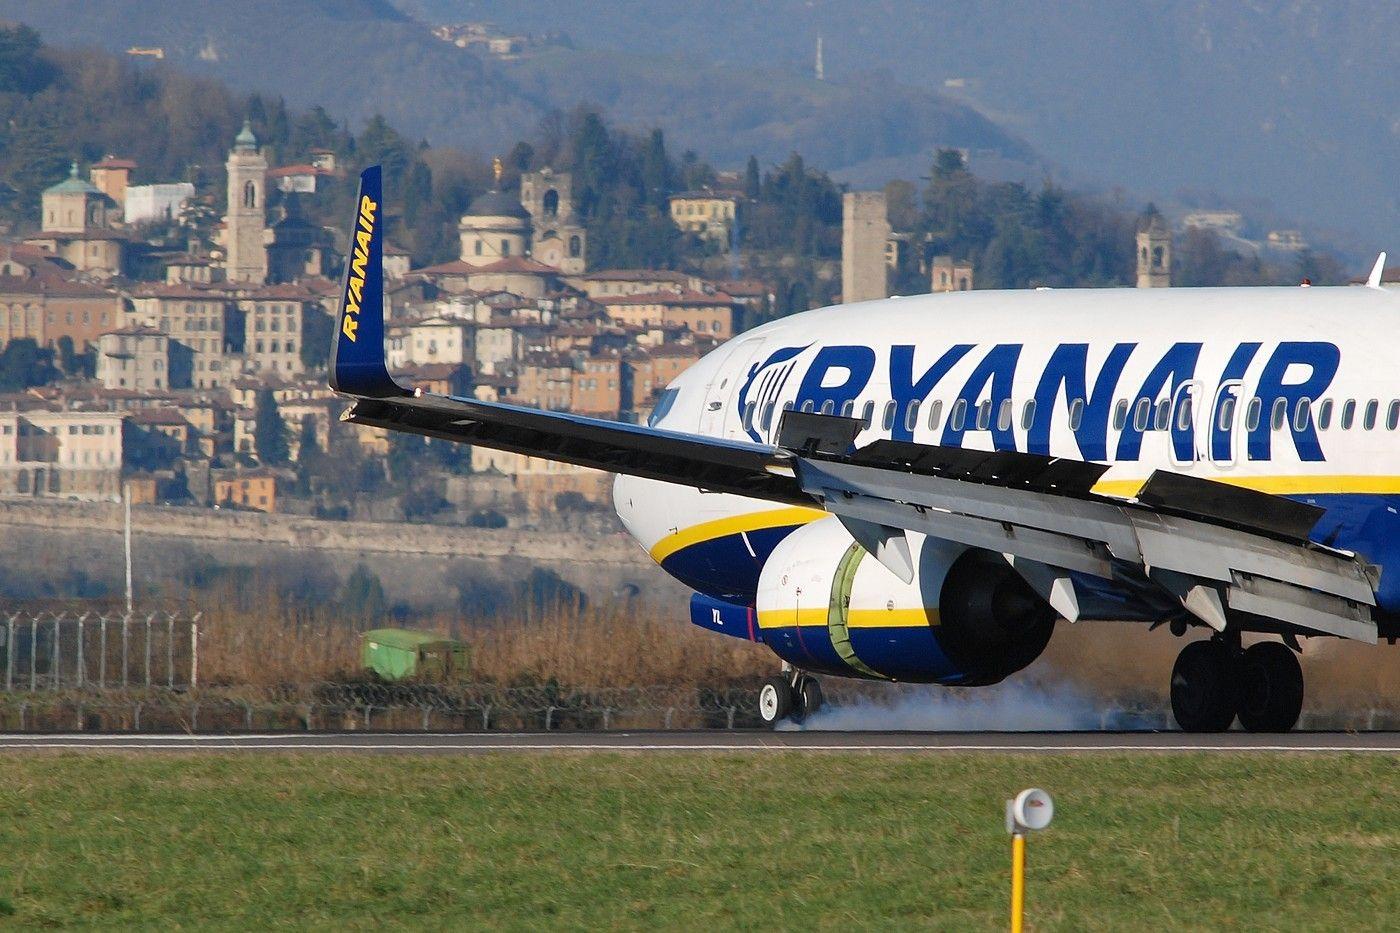 Bergamo Airport - Italy